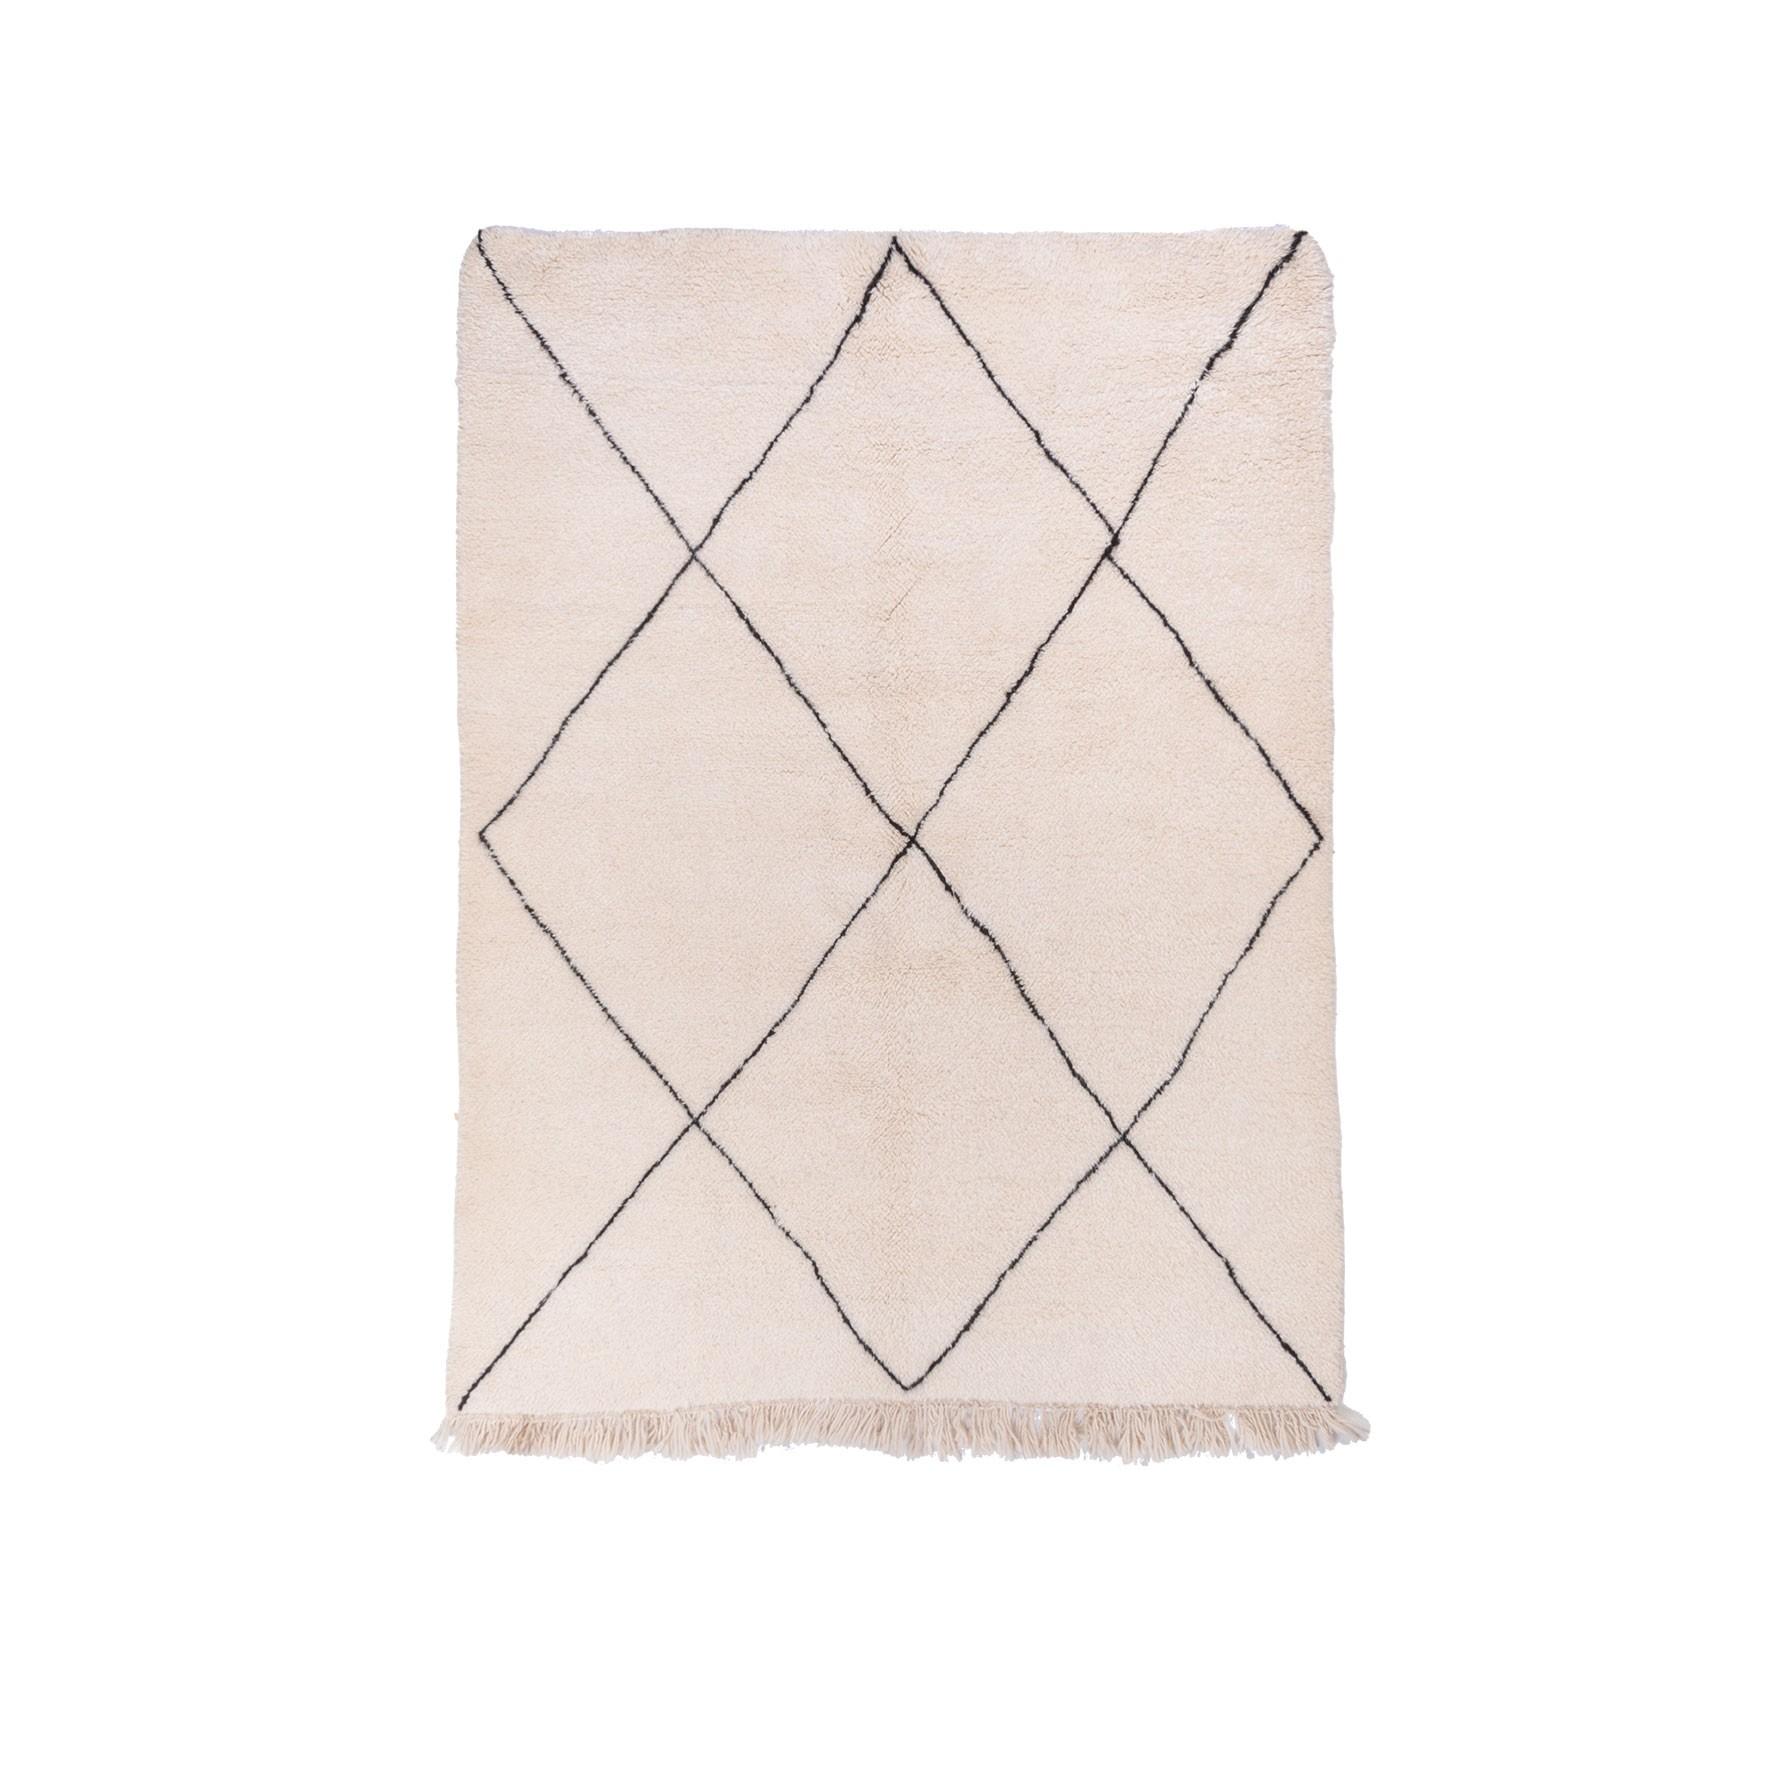 Beni Ouarain rug 4 diamonds black outline